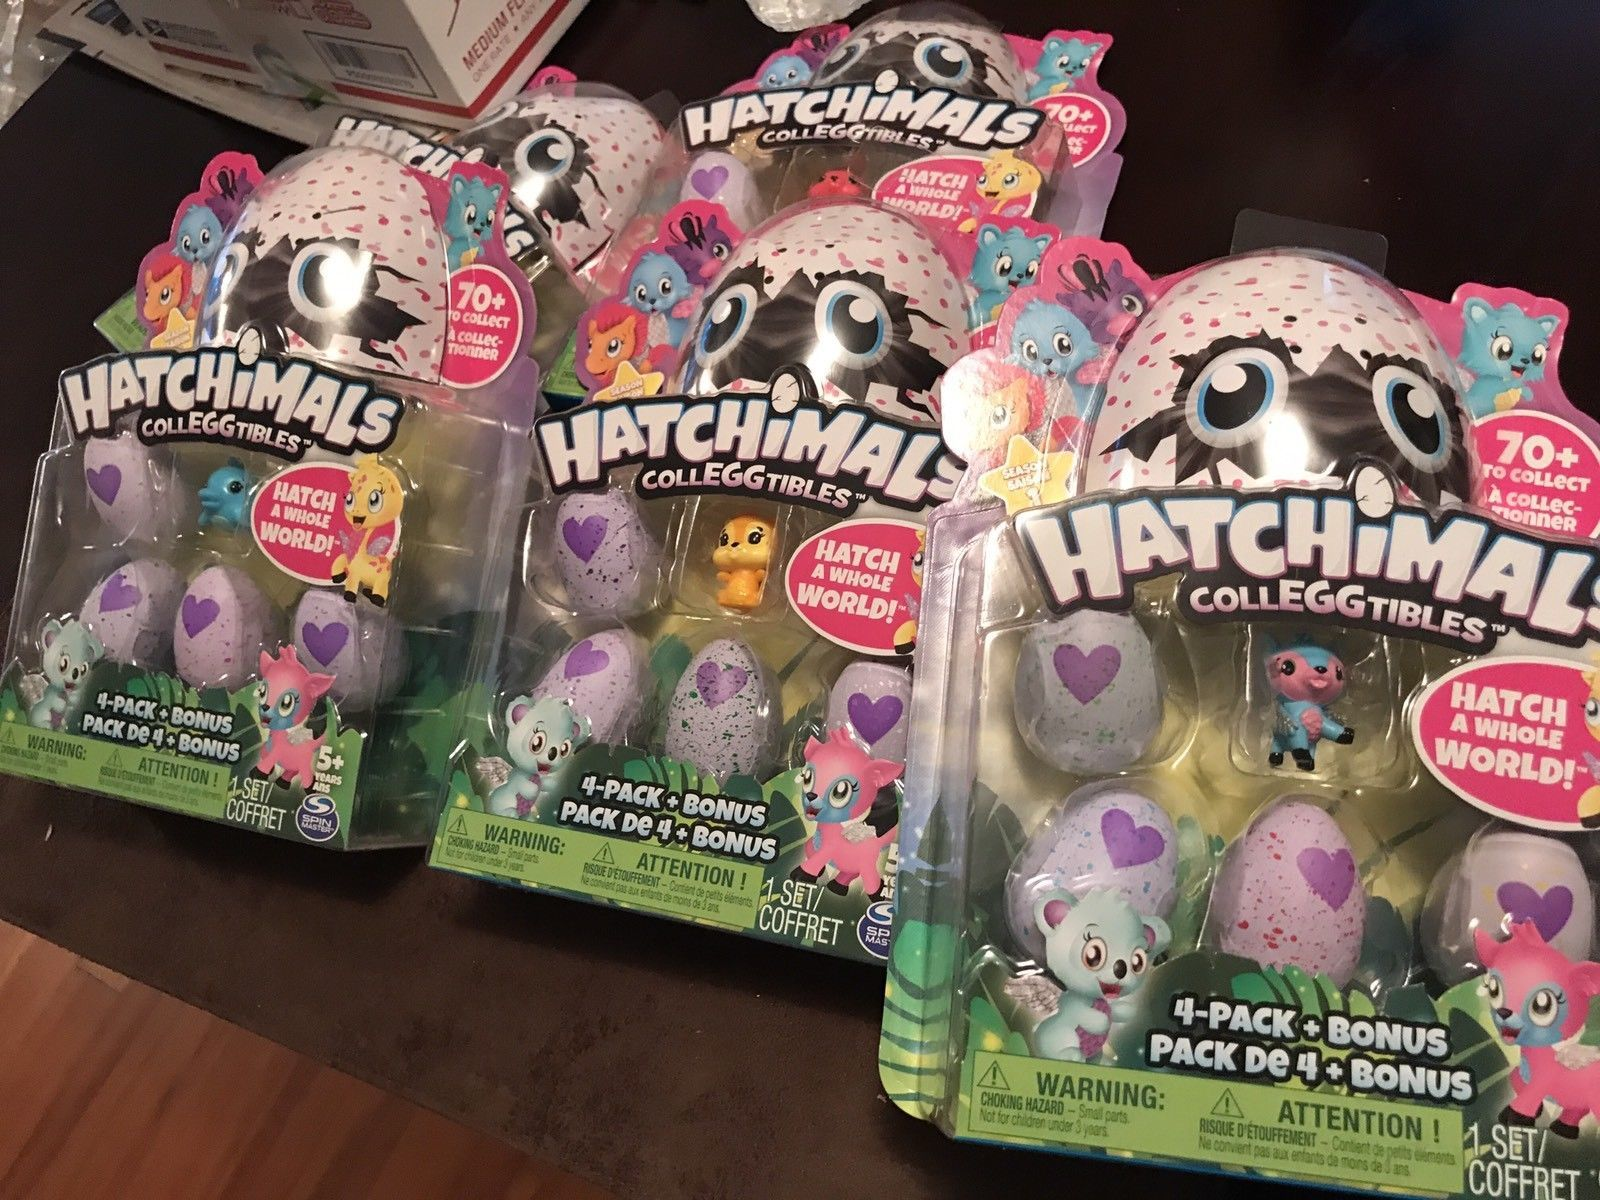 Hatchimals - Colleggtibles - 4-Pack Bonus Plus Spinmaster